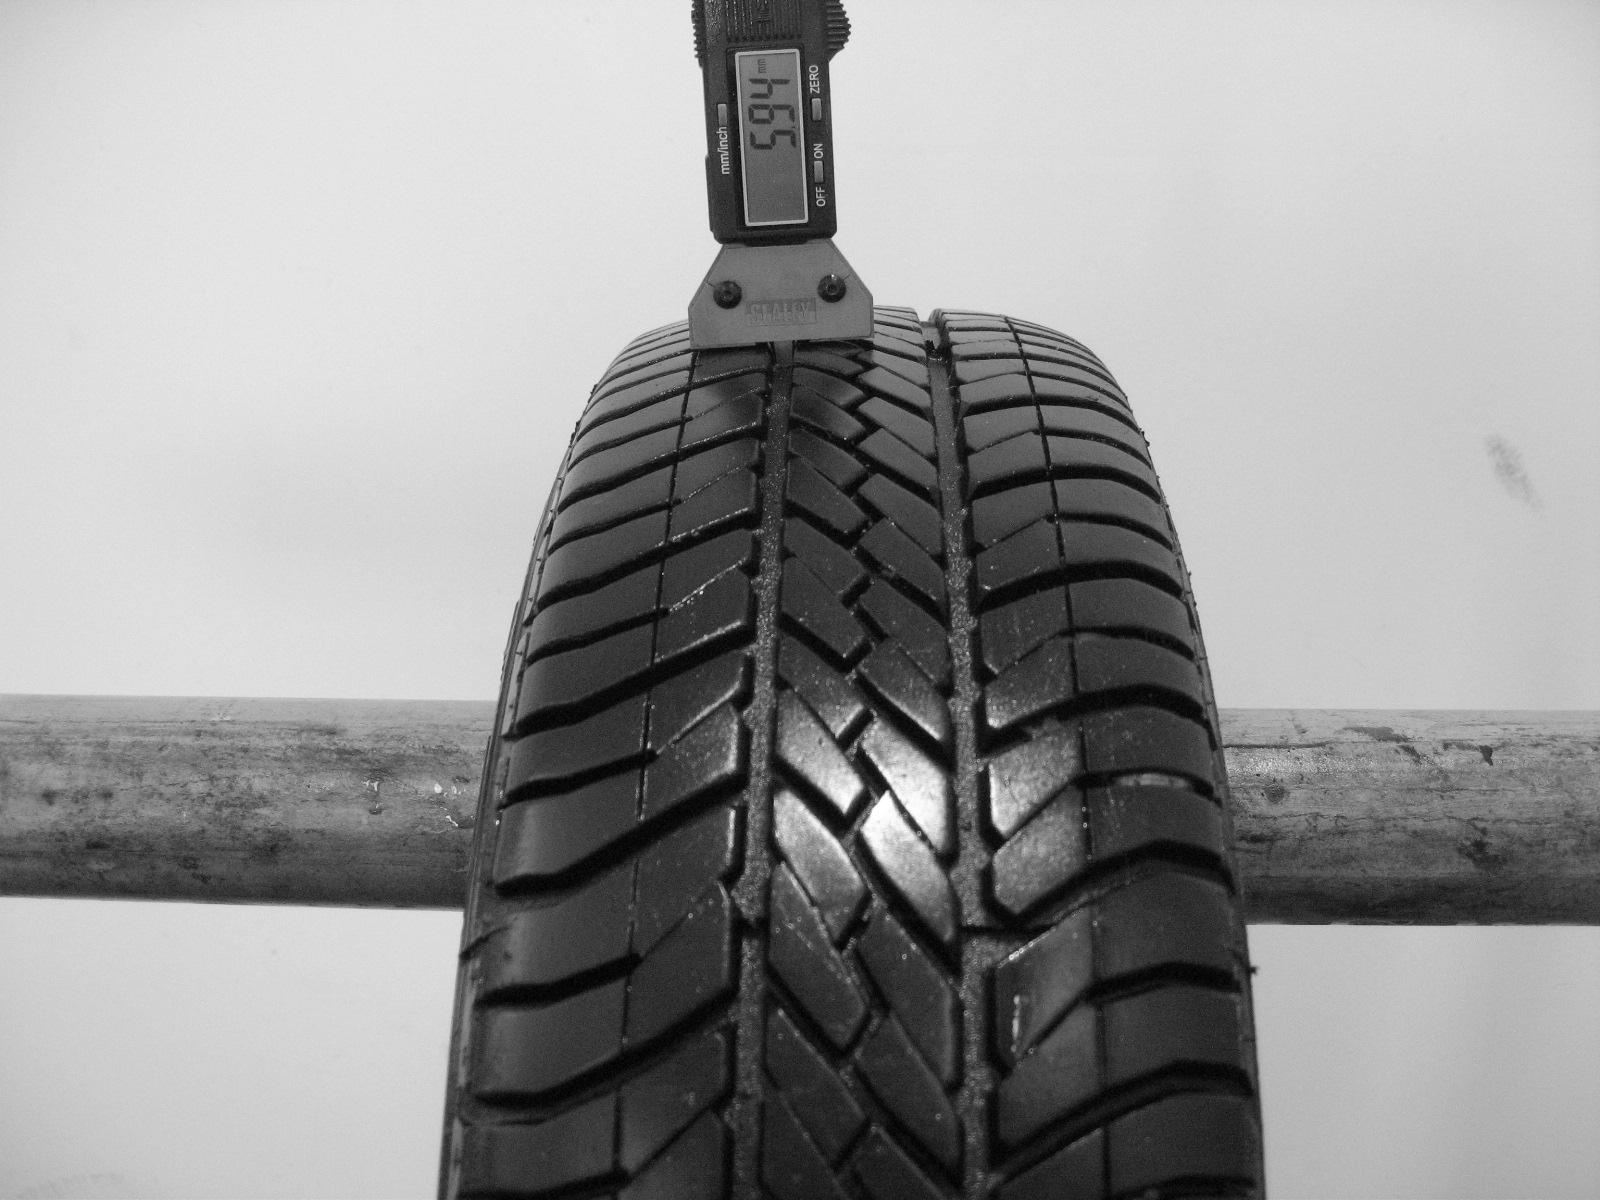 Použité-Pneu-Bazar - 165/65 R14 GOODYEAR GT2-kusovka-rezerva 3mm